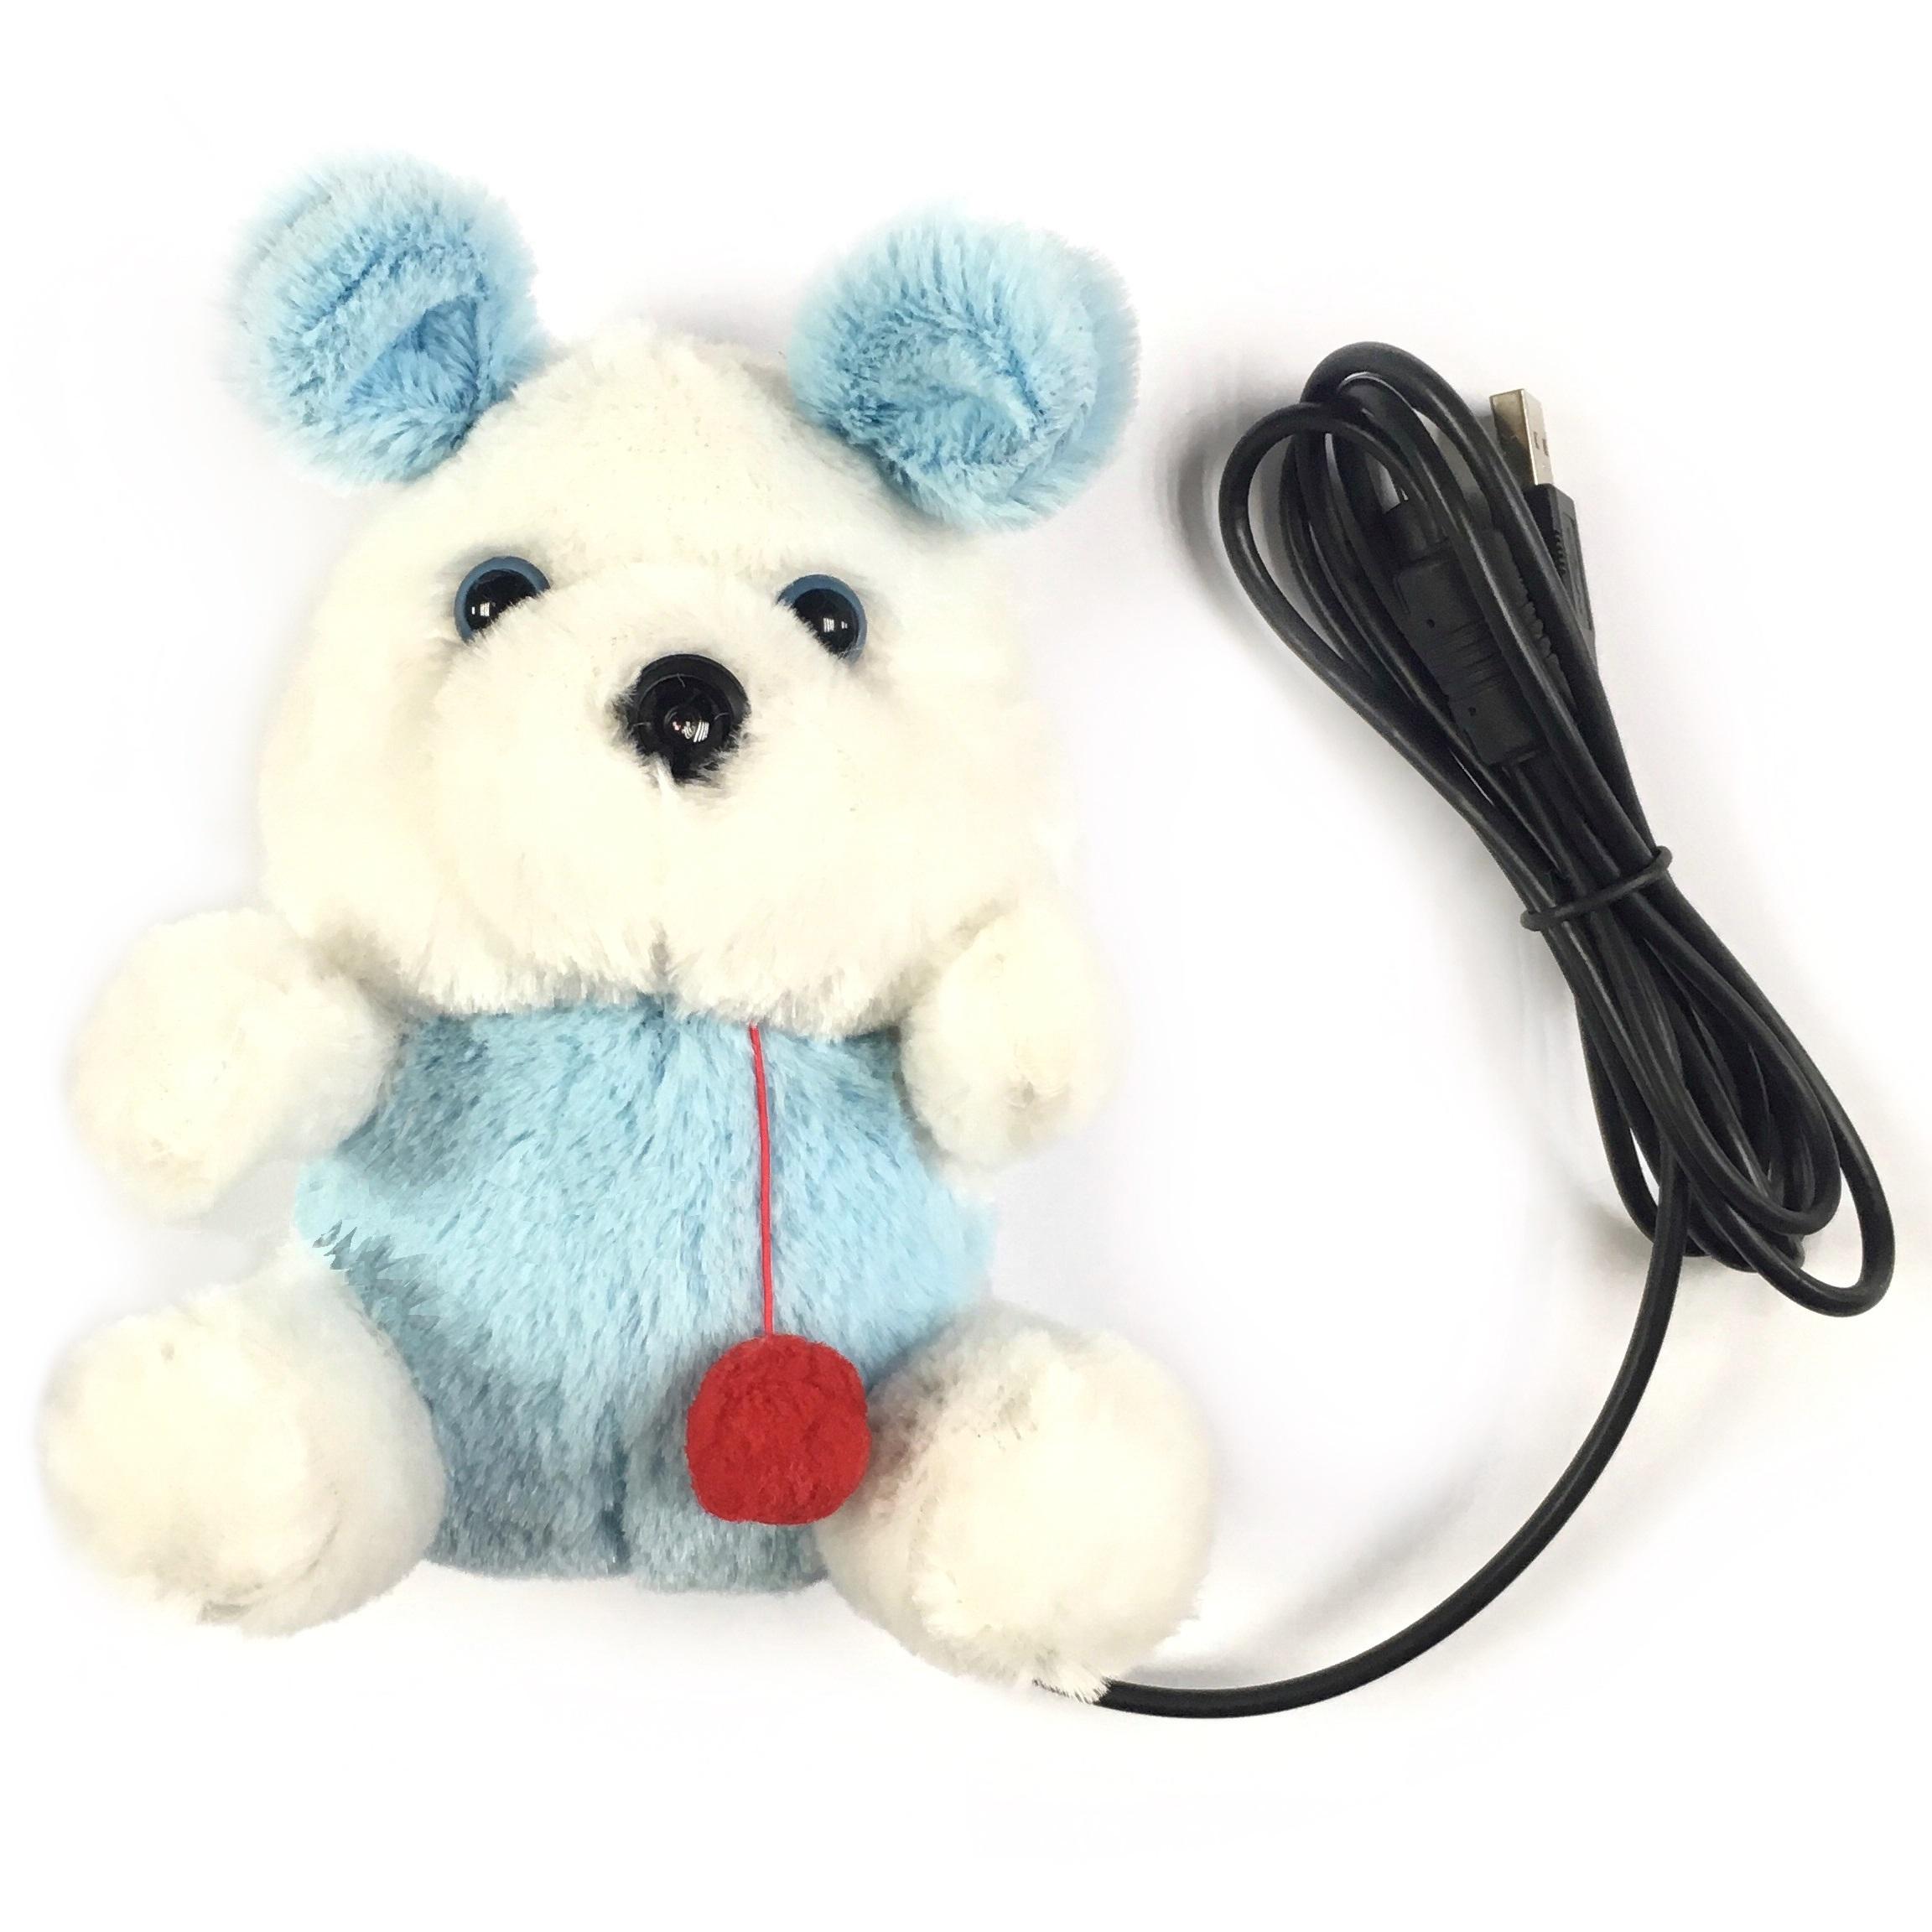 Web-камера AGESTAR S-PC219, Заяц, USB, S-PC219, белый, голубой видеоэффекты для веб камеры